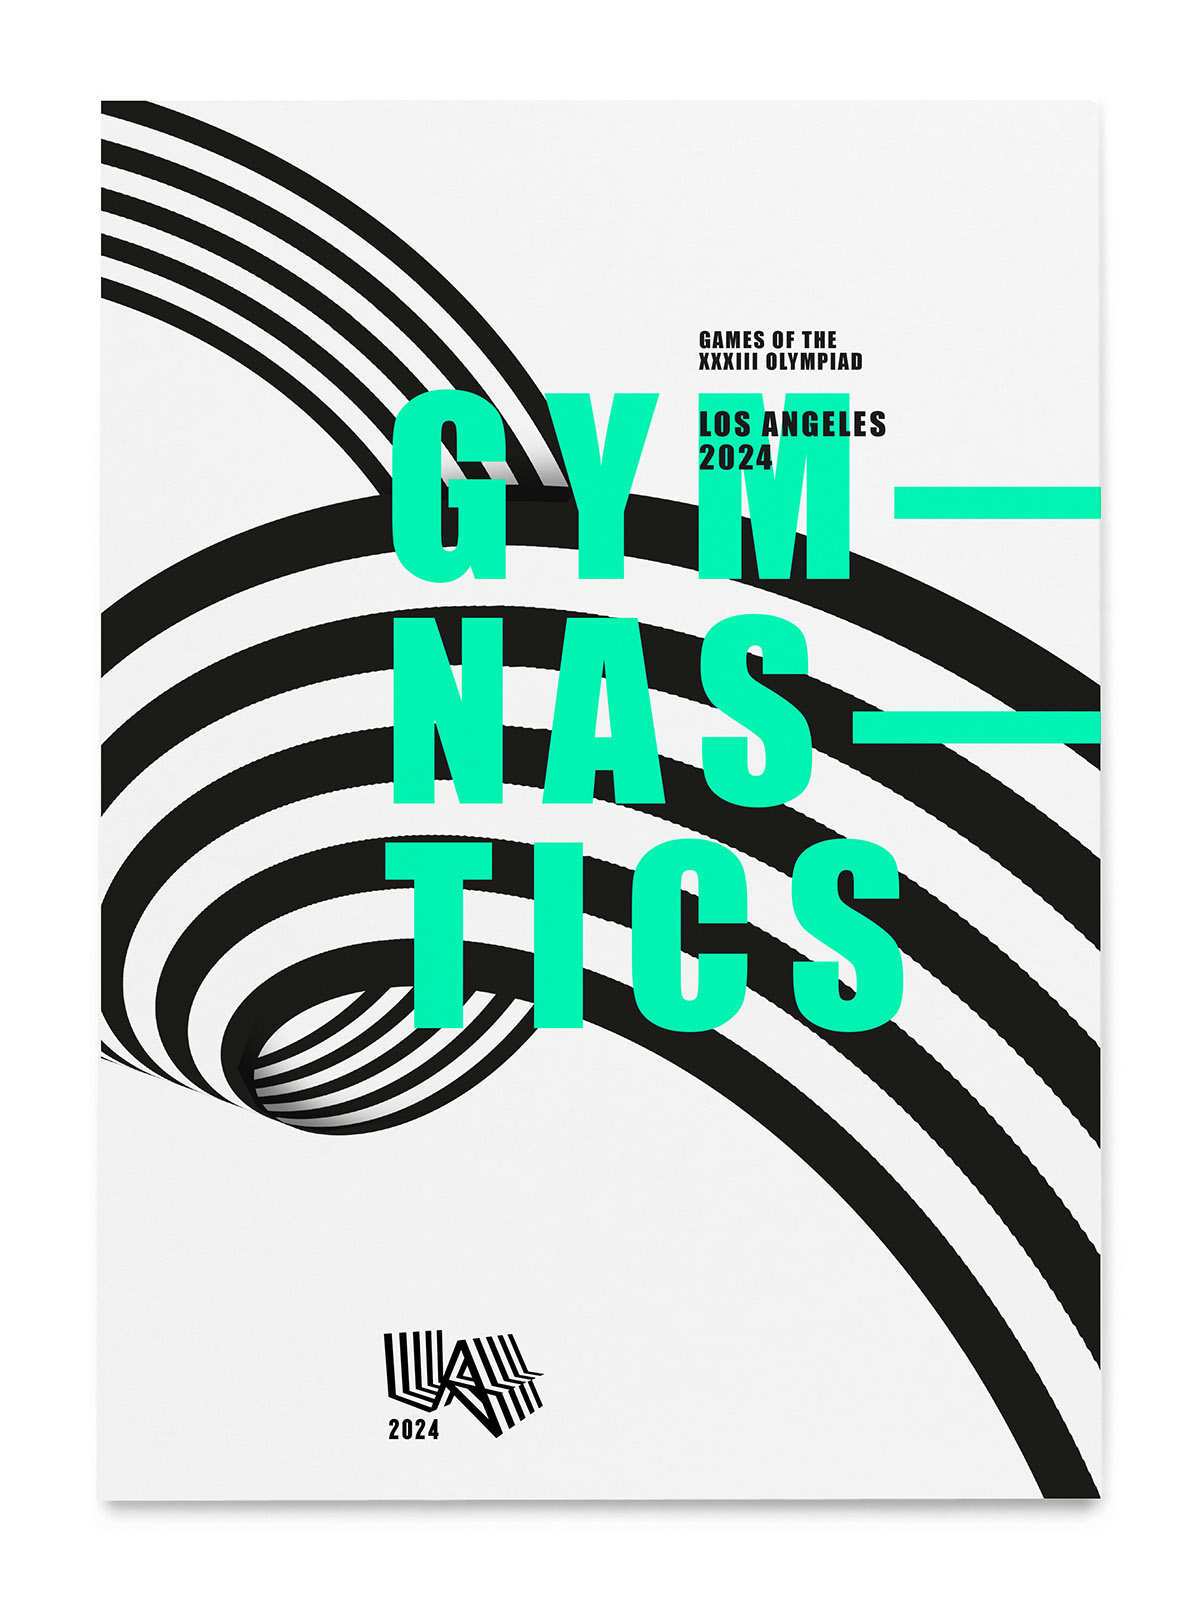 la Olympic Bid City LA 2024 Bid City Identity movement impact stripes star stars and stripes